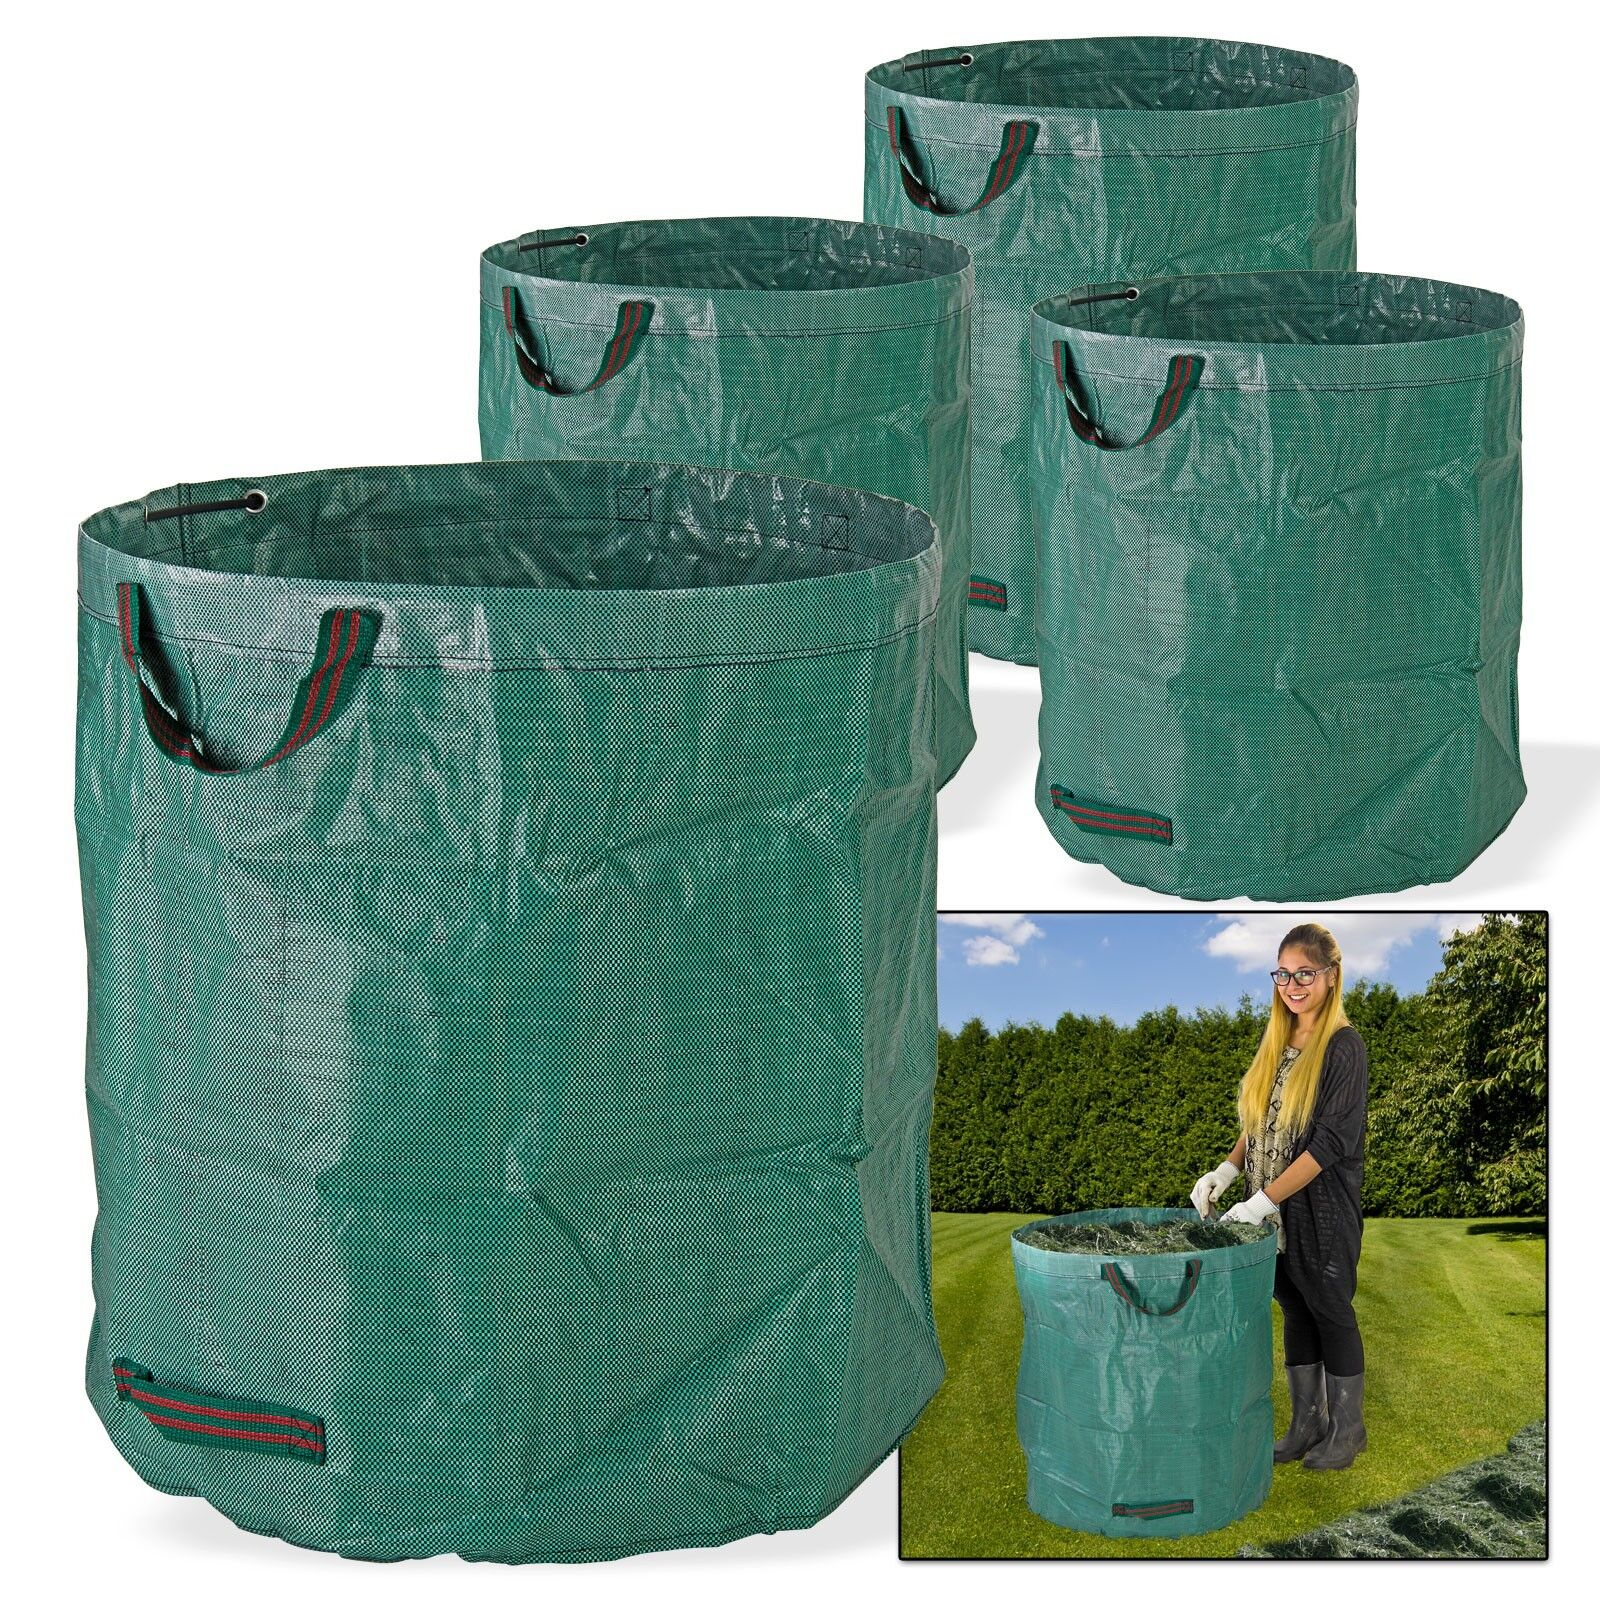 4er Set Garten Abfallsack Laubsack selbstaufstellend pop 272 Liter XXL faltbar